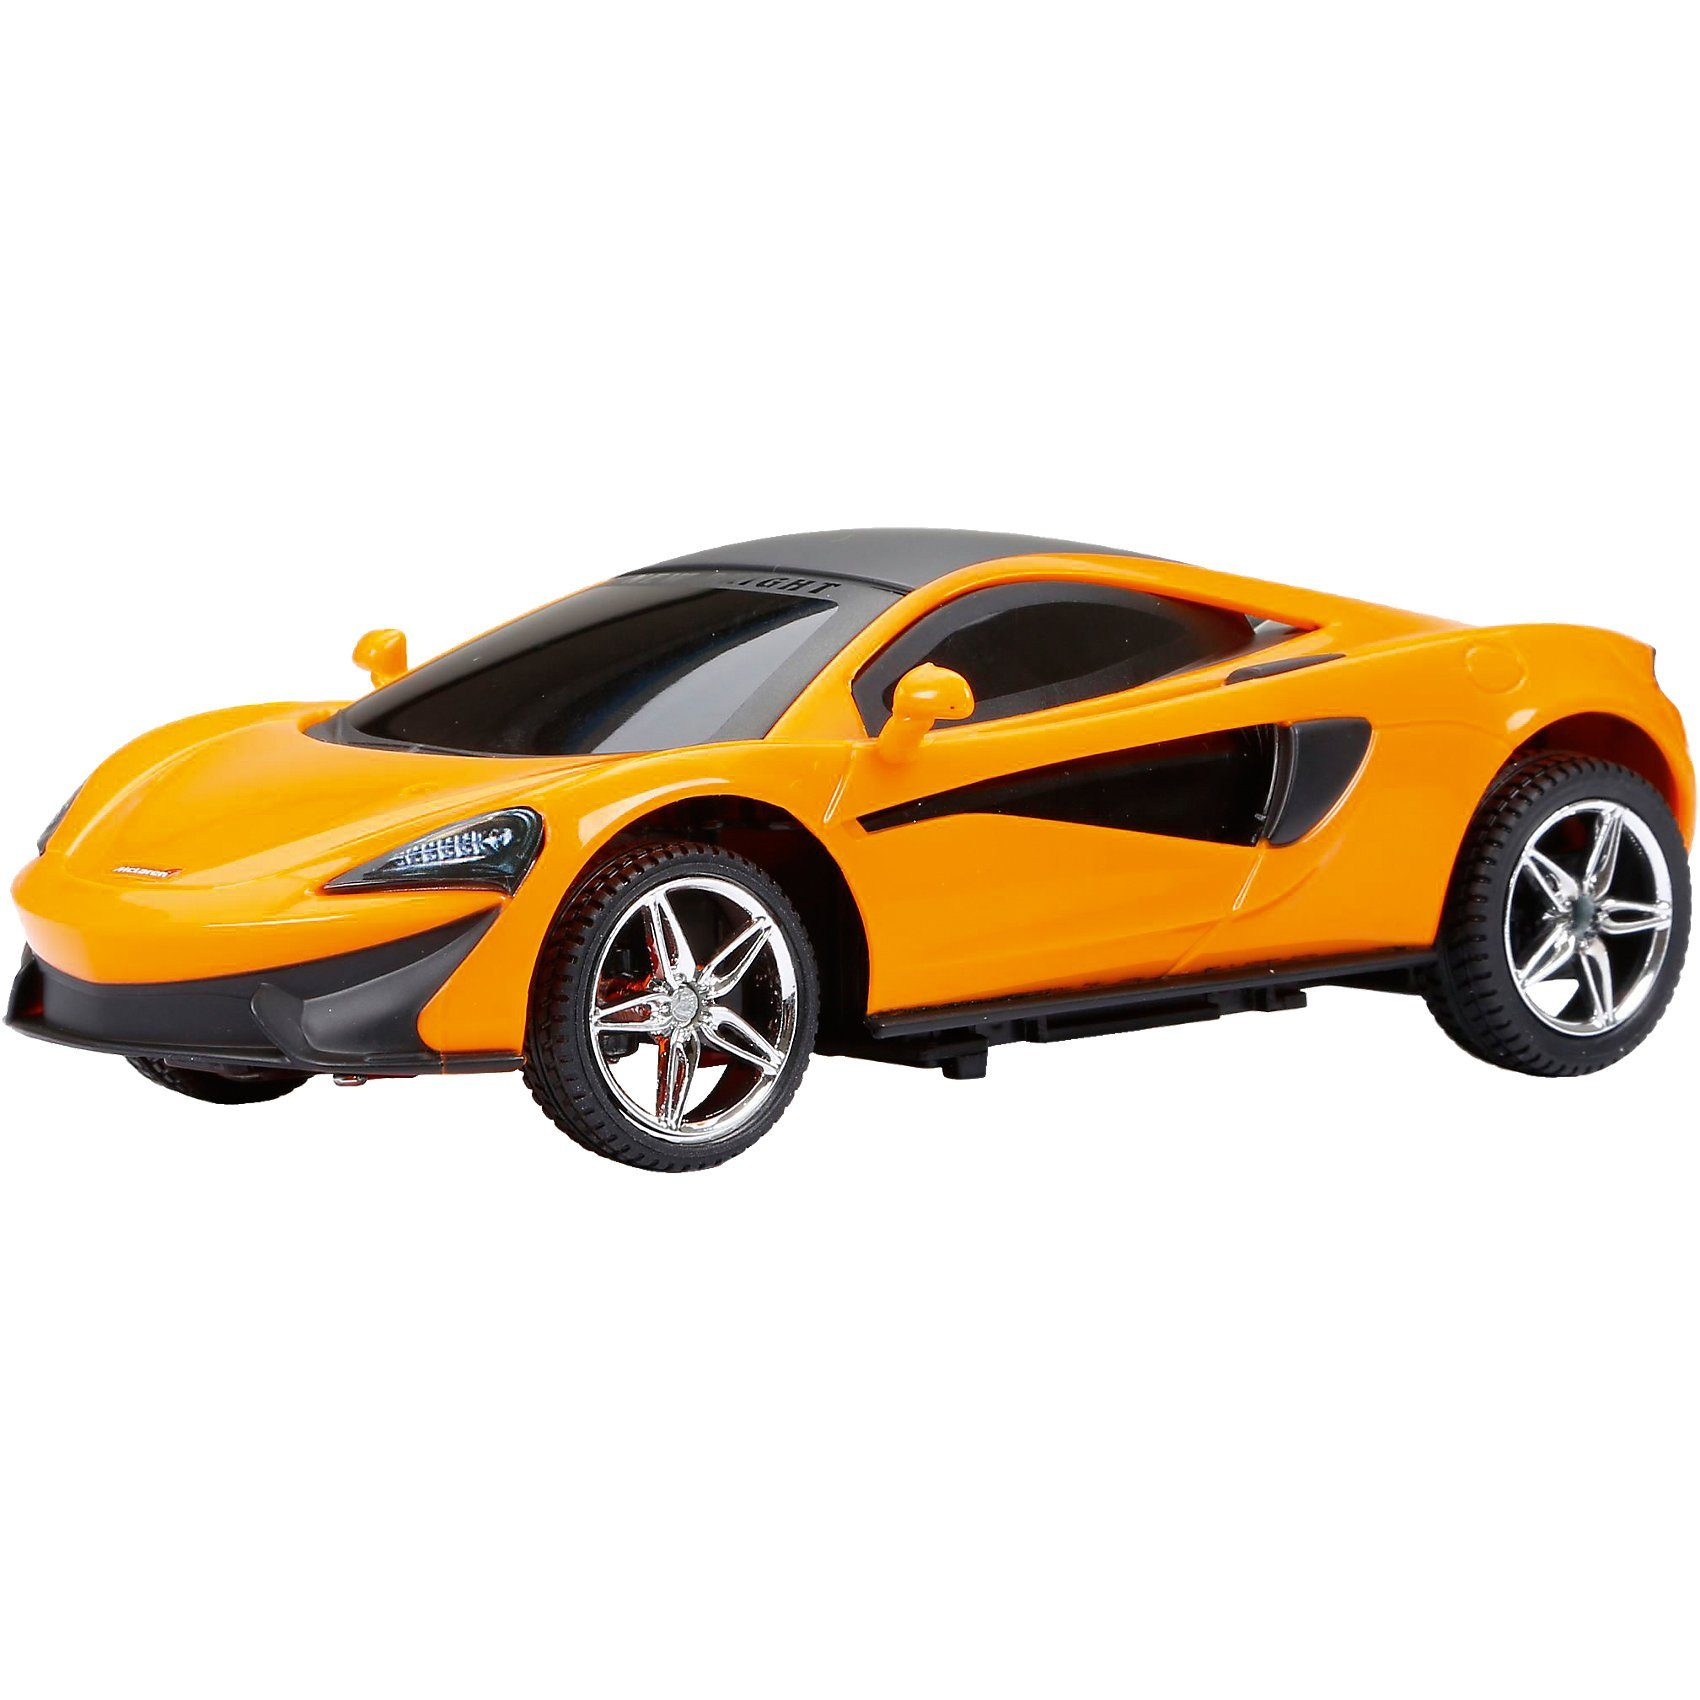 New Bright RC Fahrzeug McLaren 570S 1:24